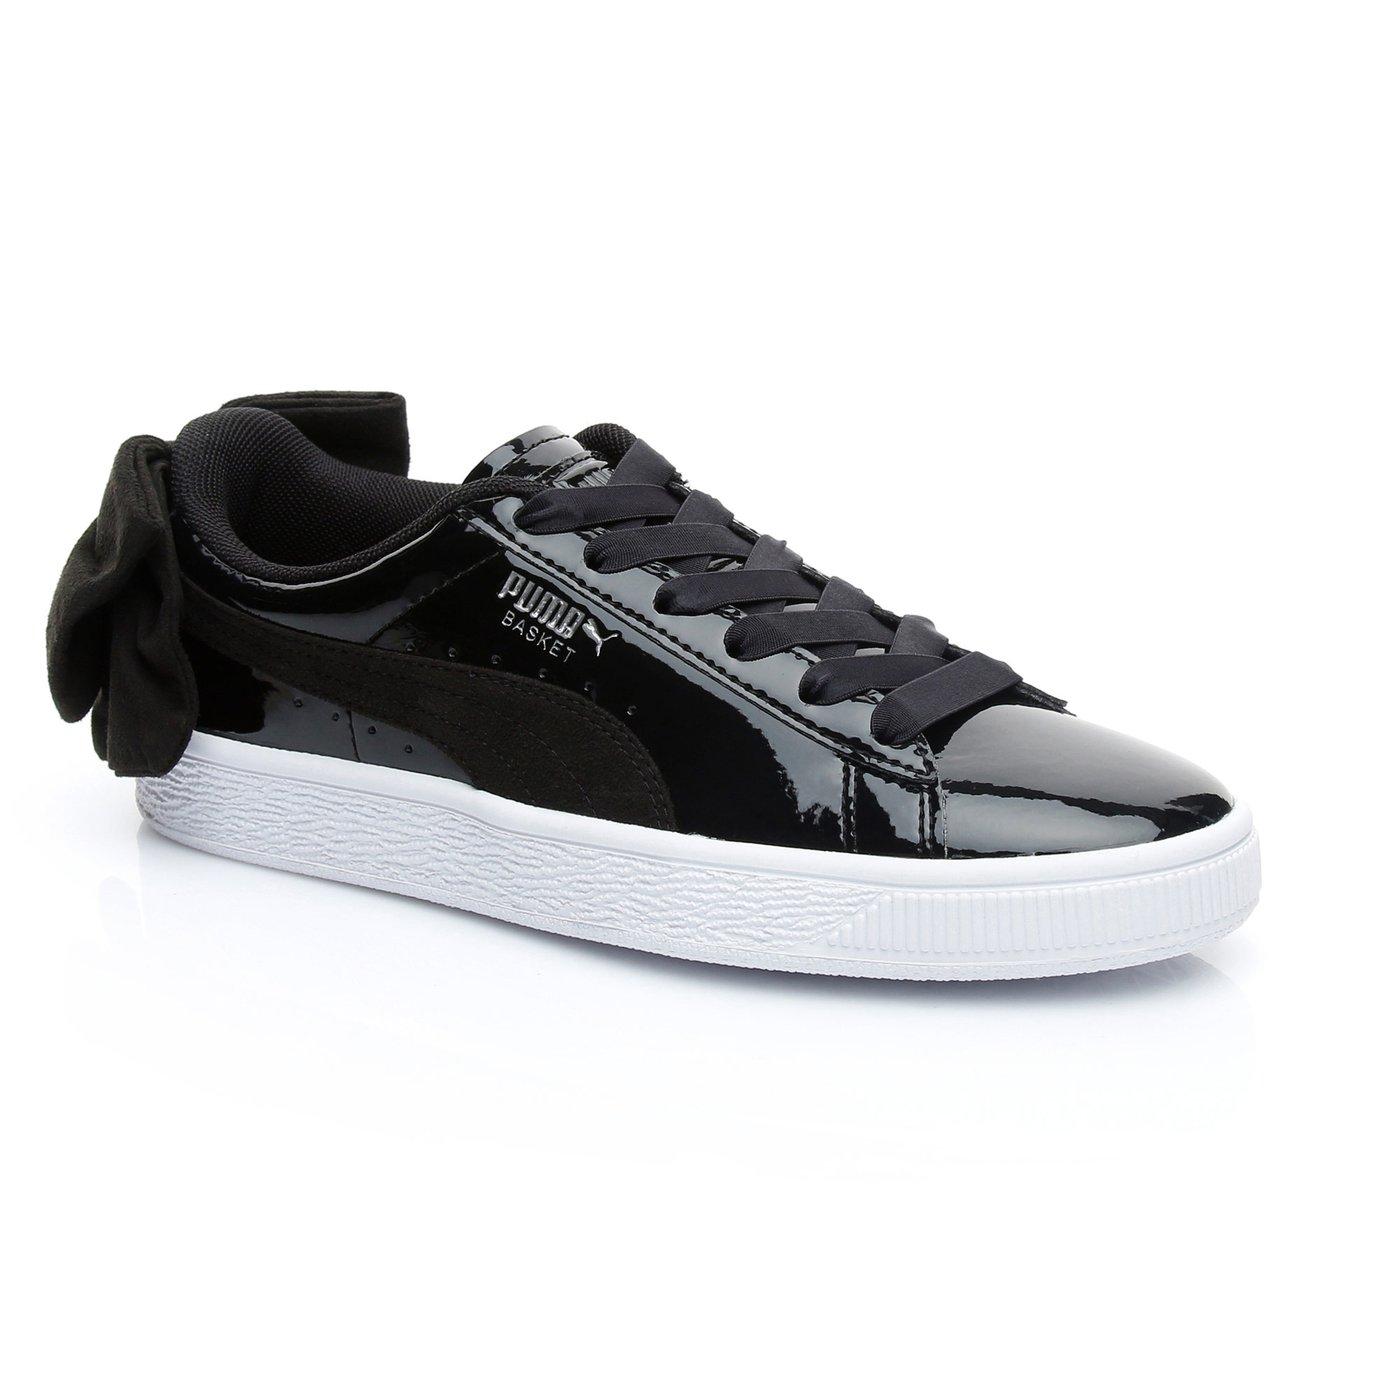 Puma Basket Bow Kadın Siyah Sneaker